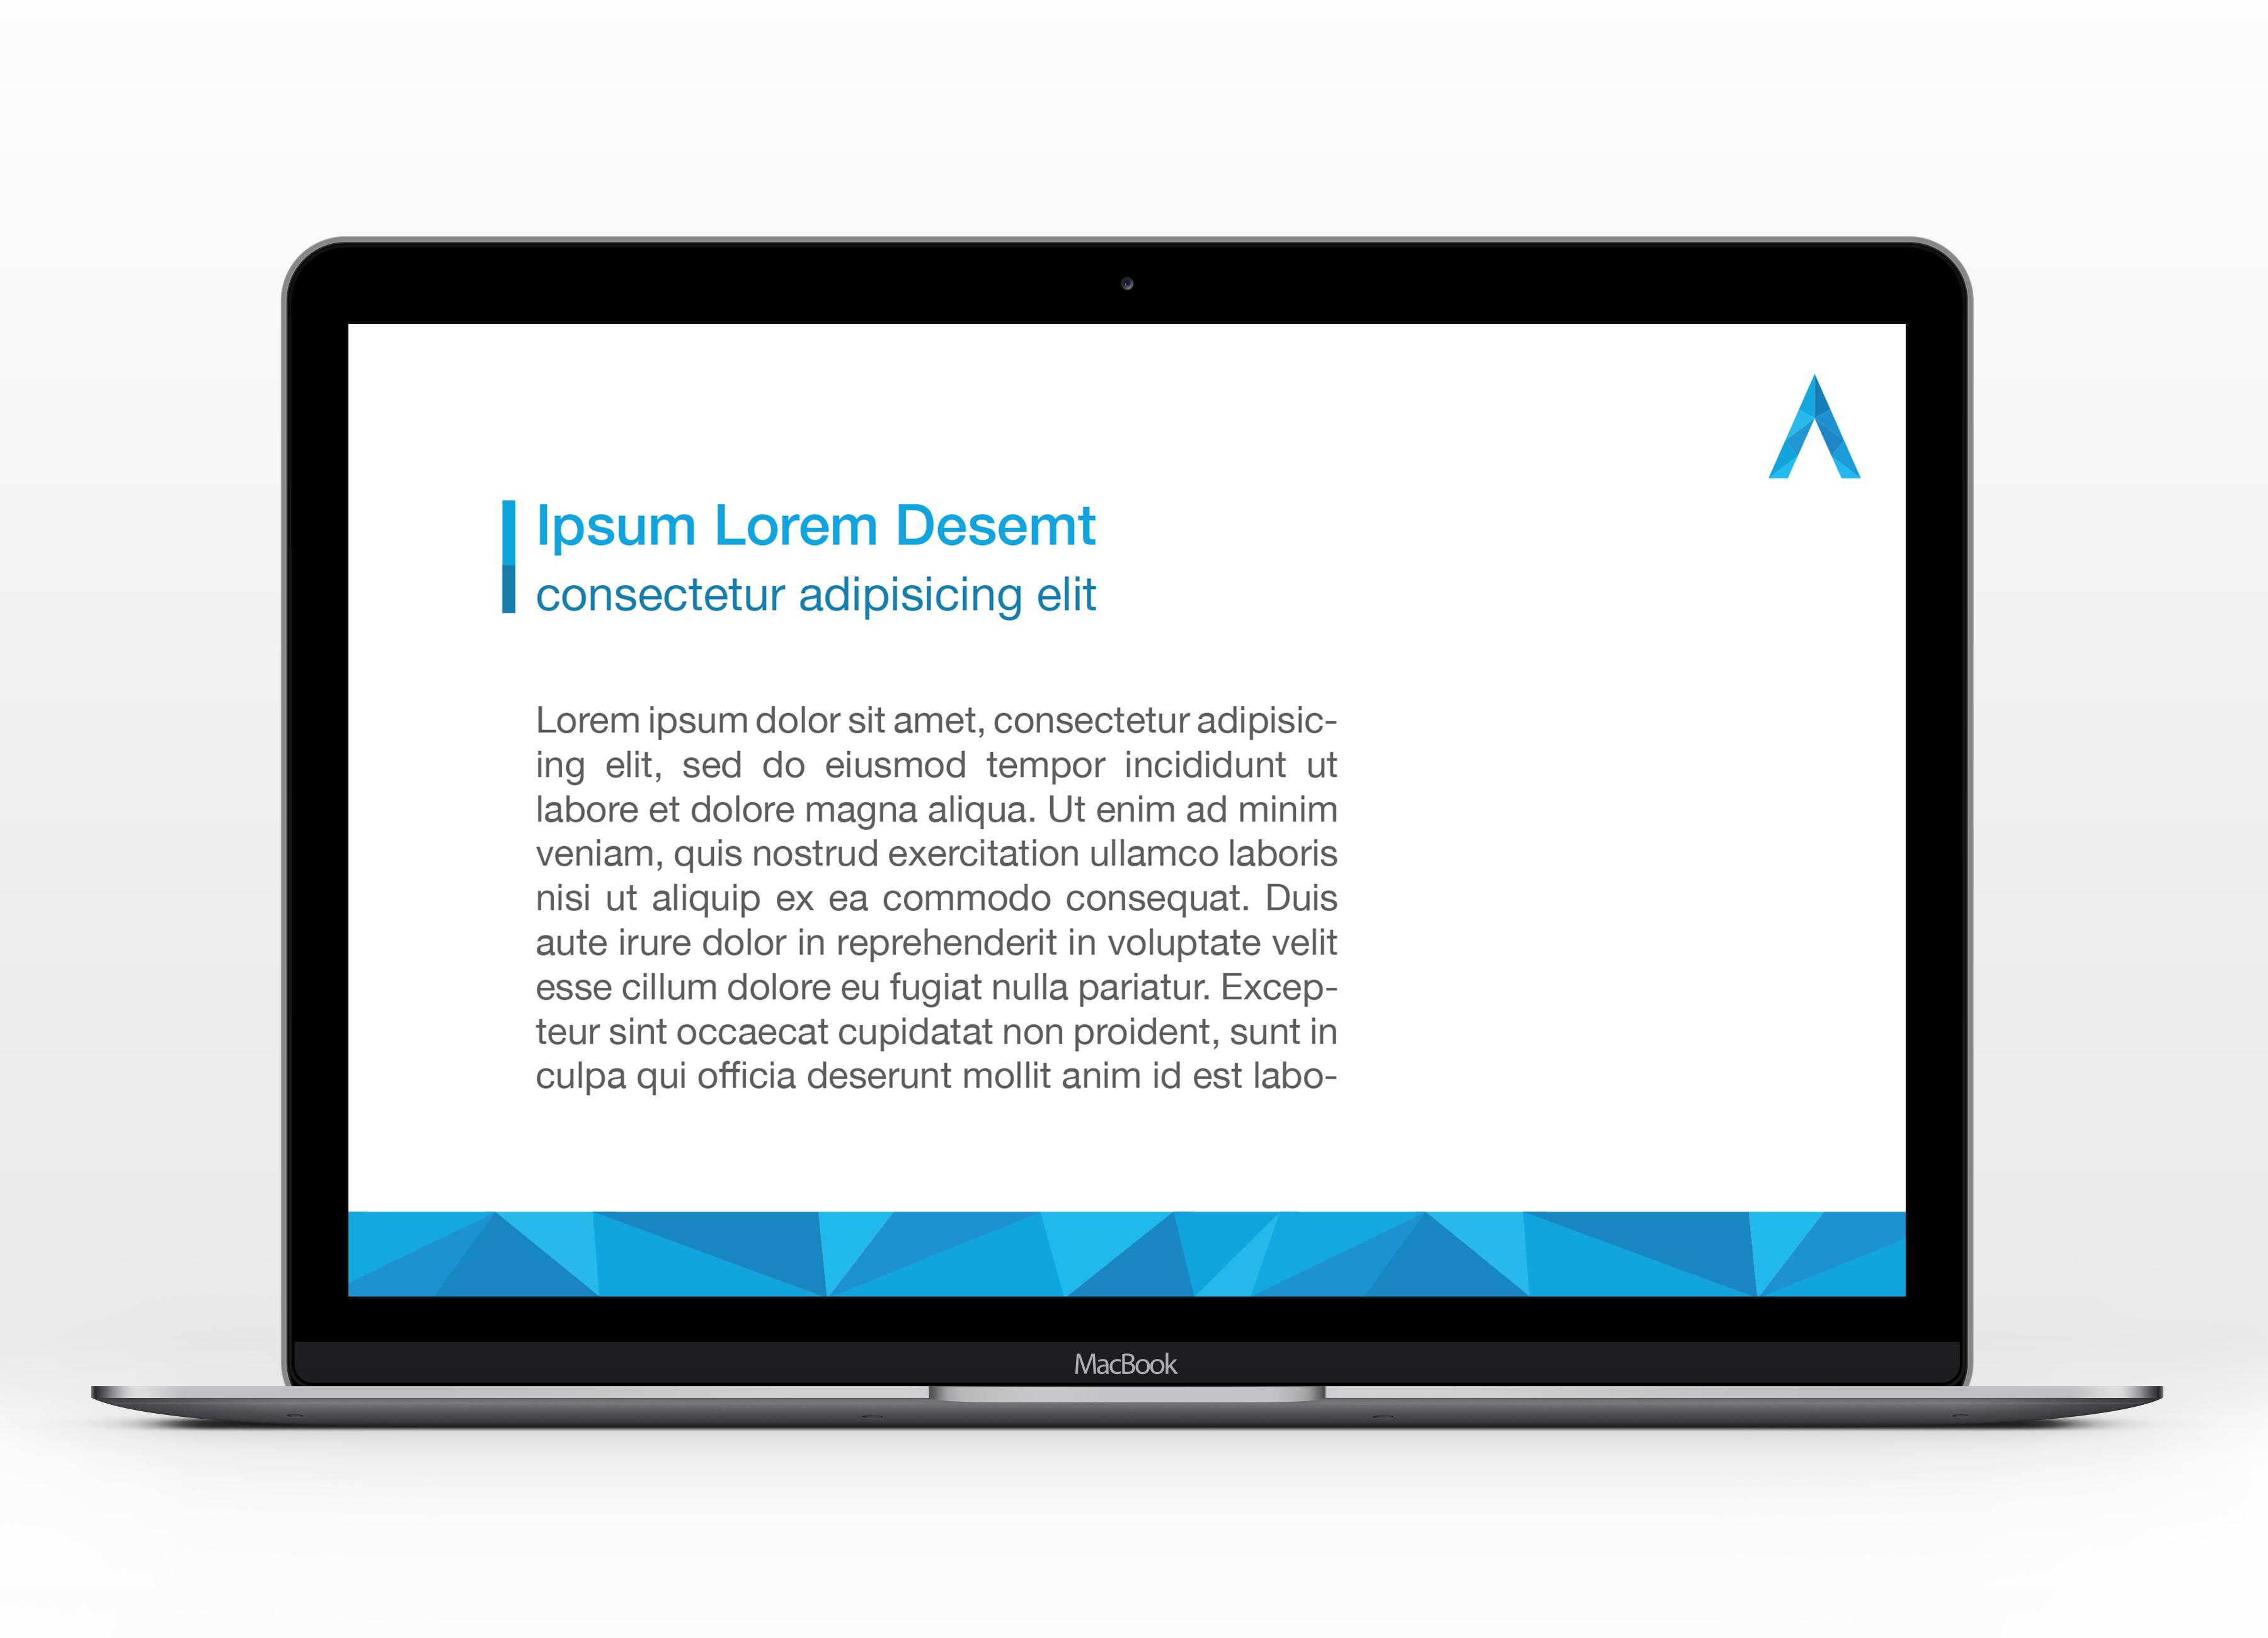 main content slide